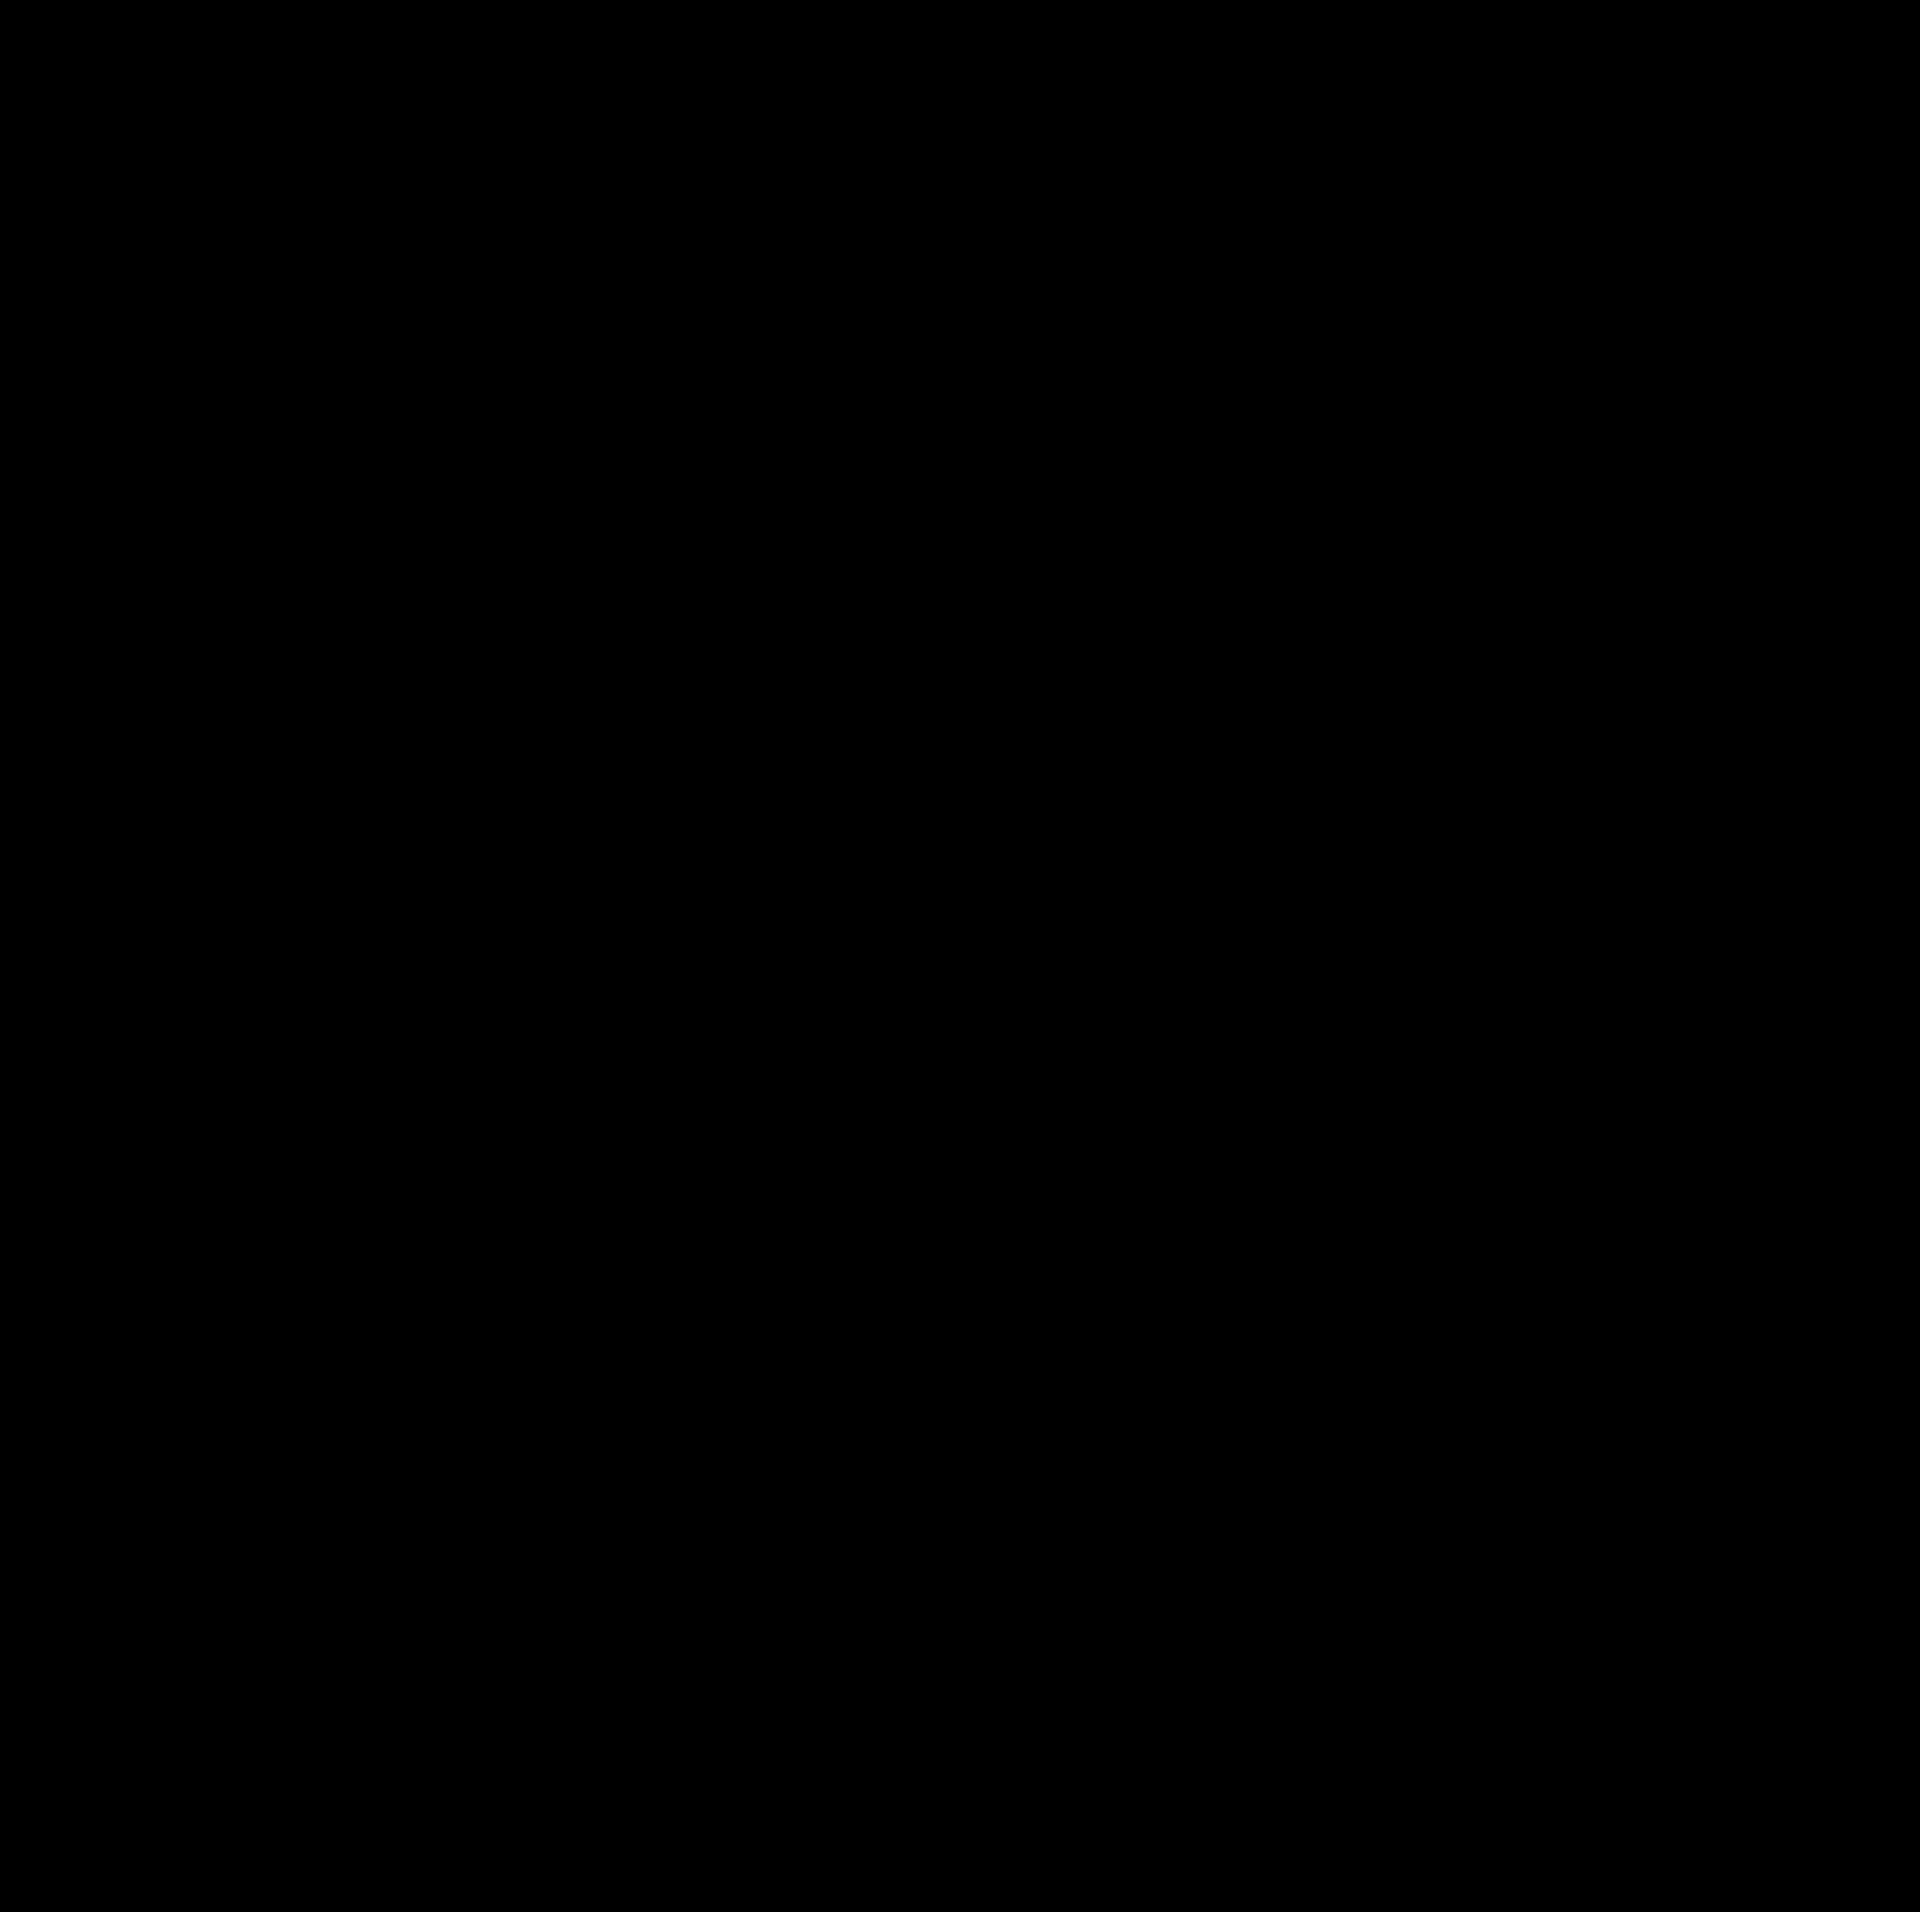 Logo 1471530366.png?ixlib=rb 1.1